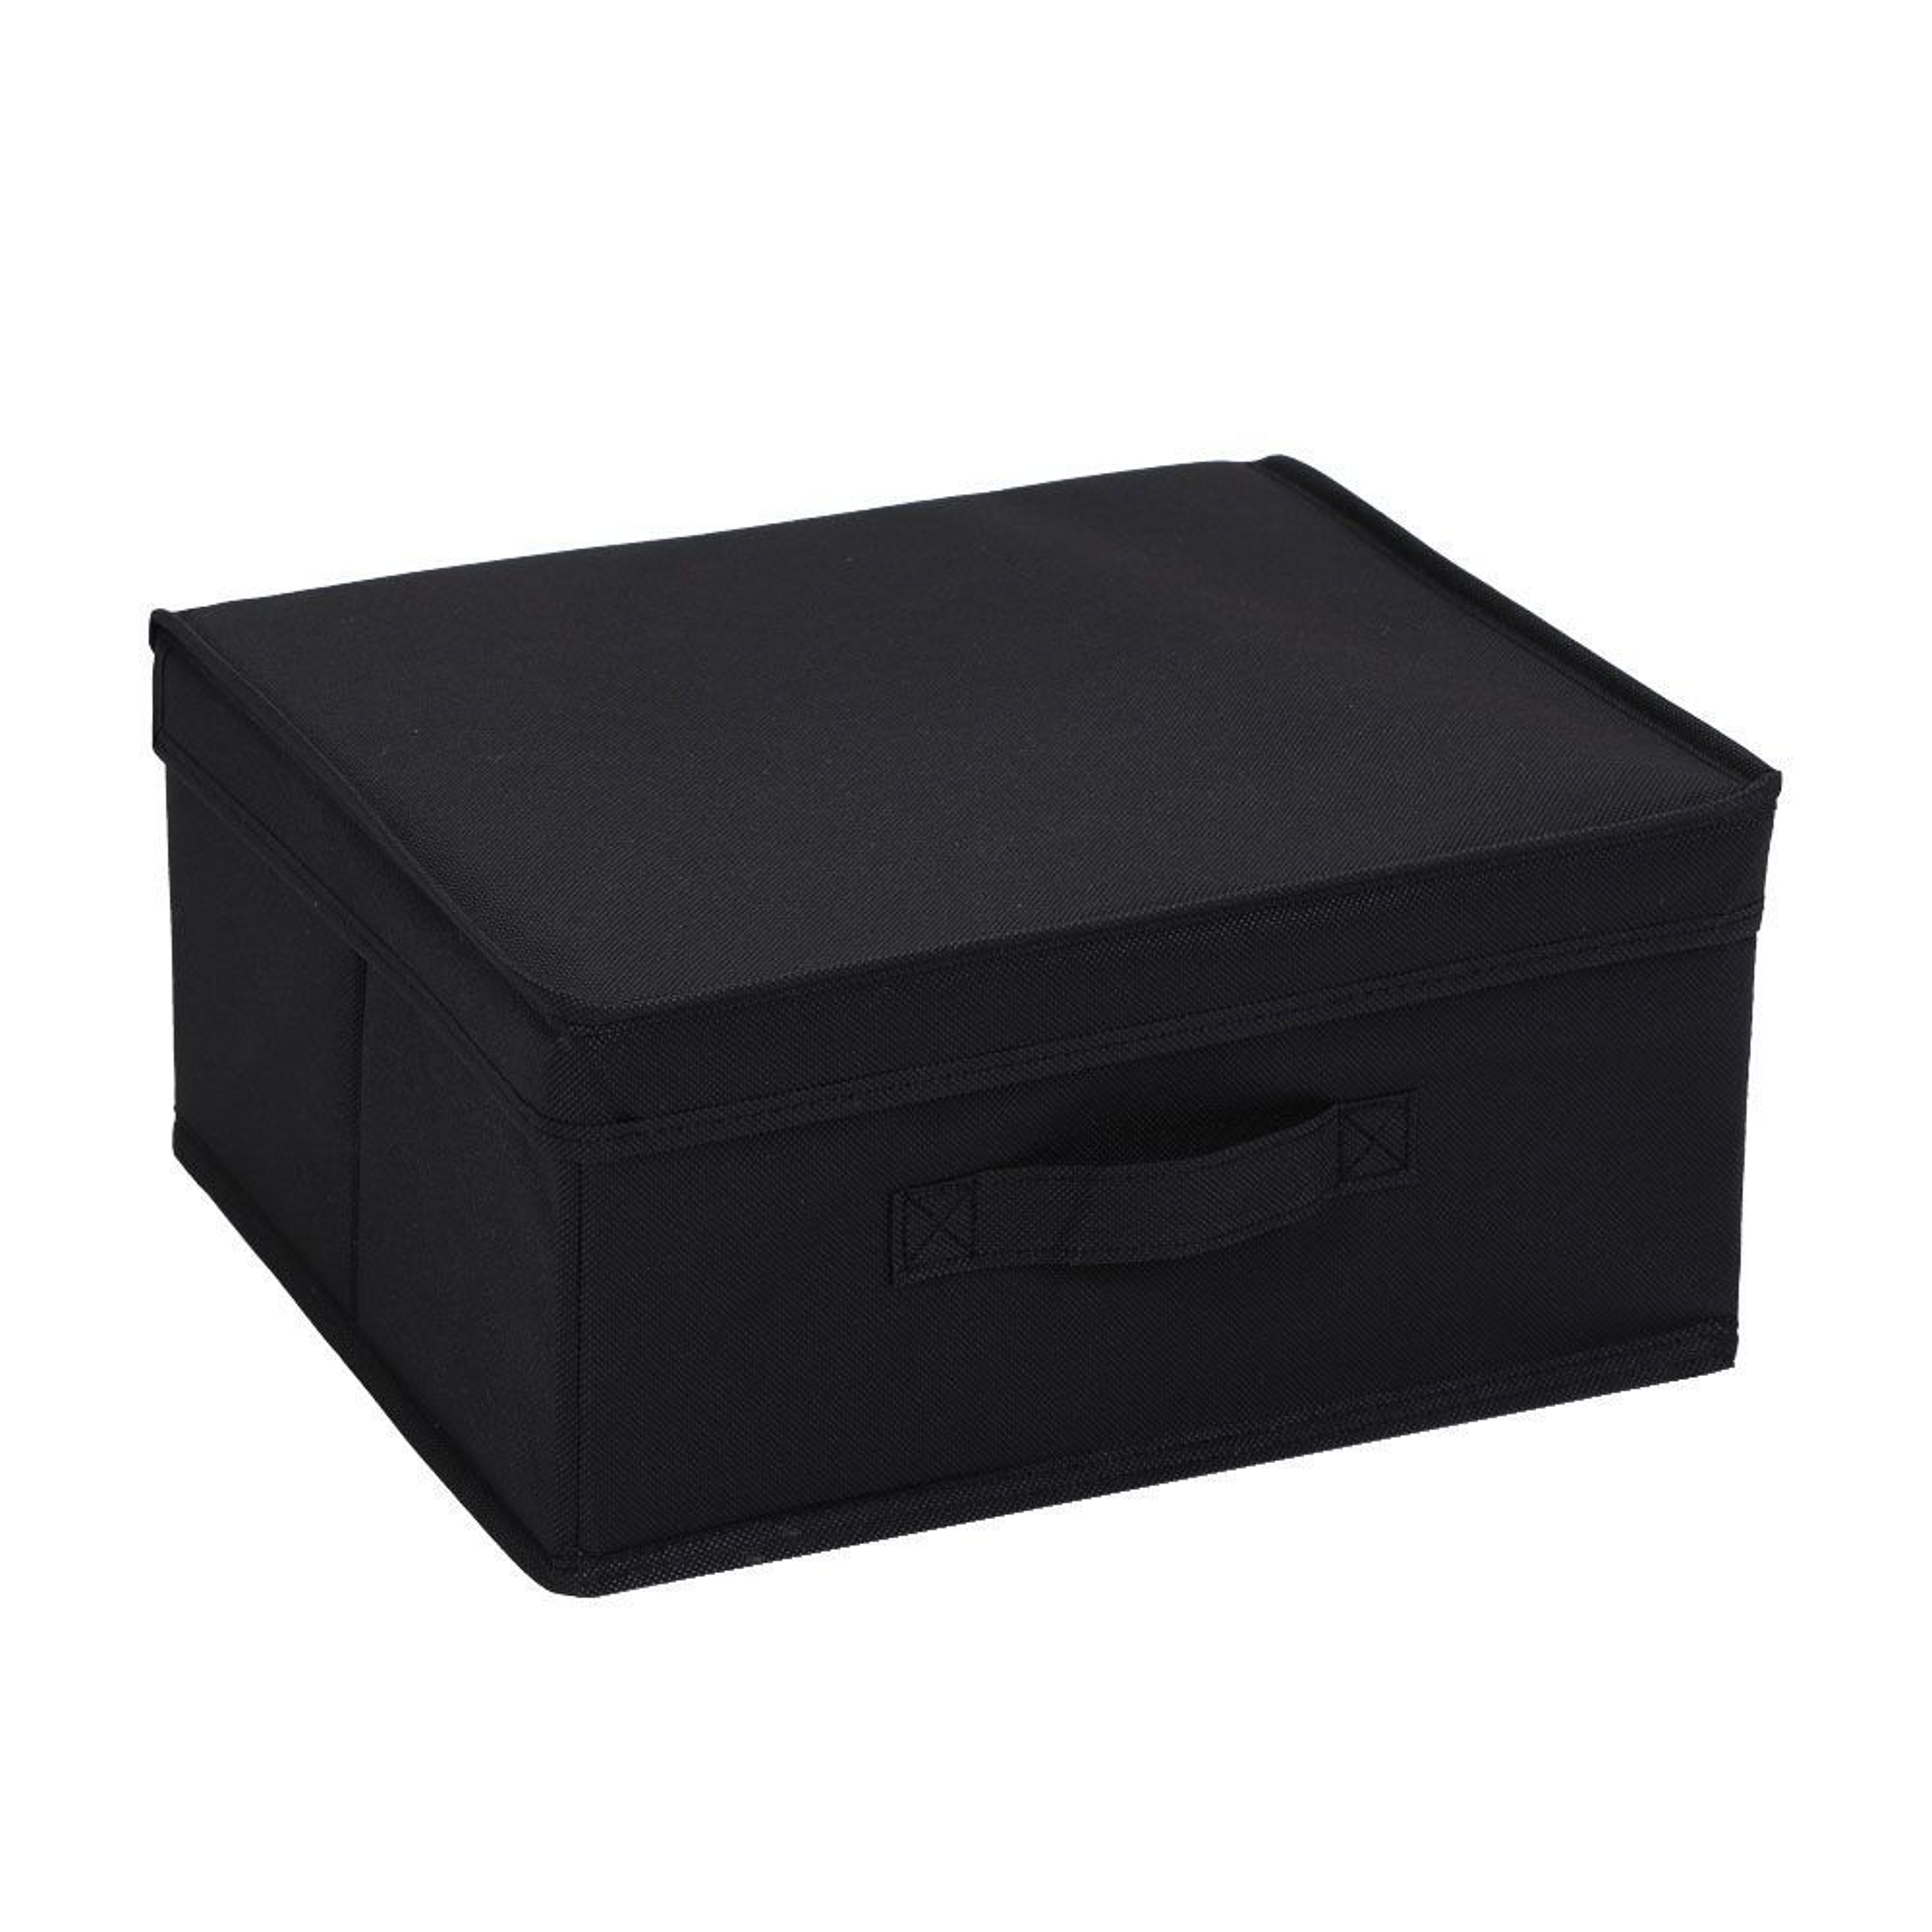 Mode Soft Storage Box with Lid Black 33 x 28 x 15cm | Home Storage & Living